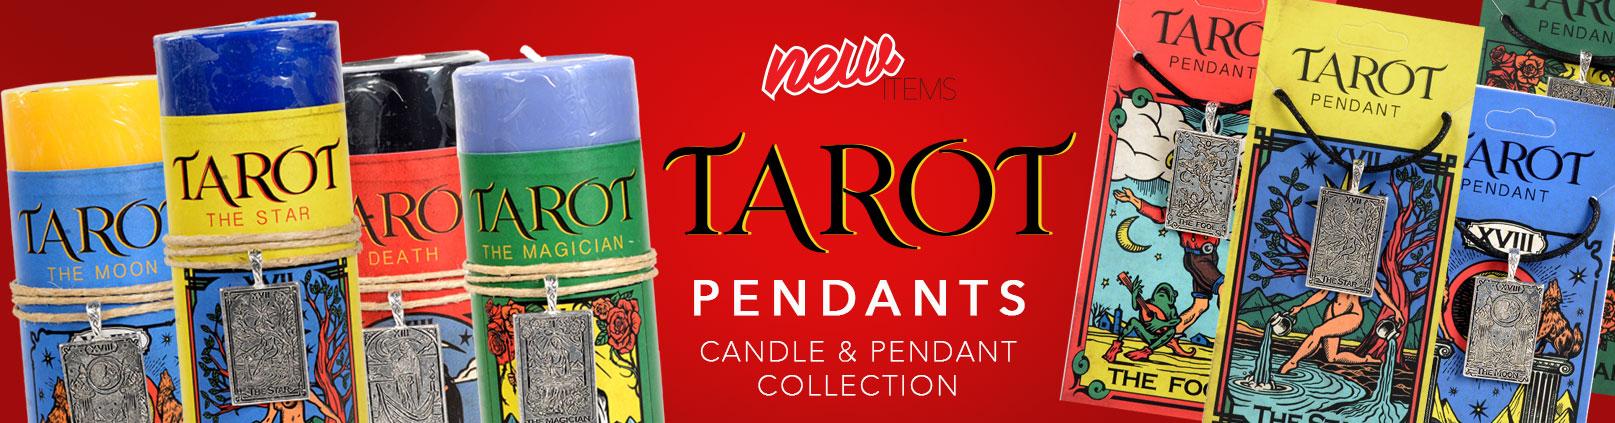 Tarot Pendants Banners